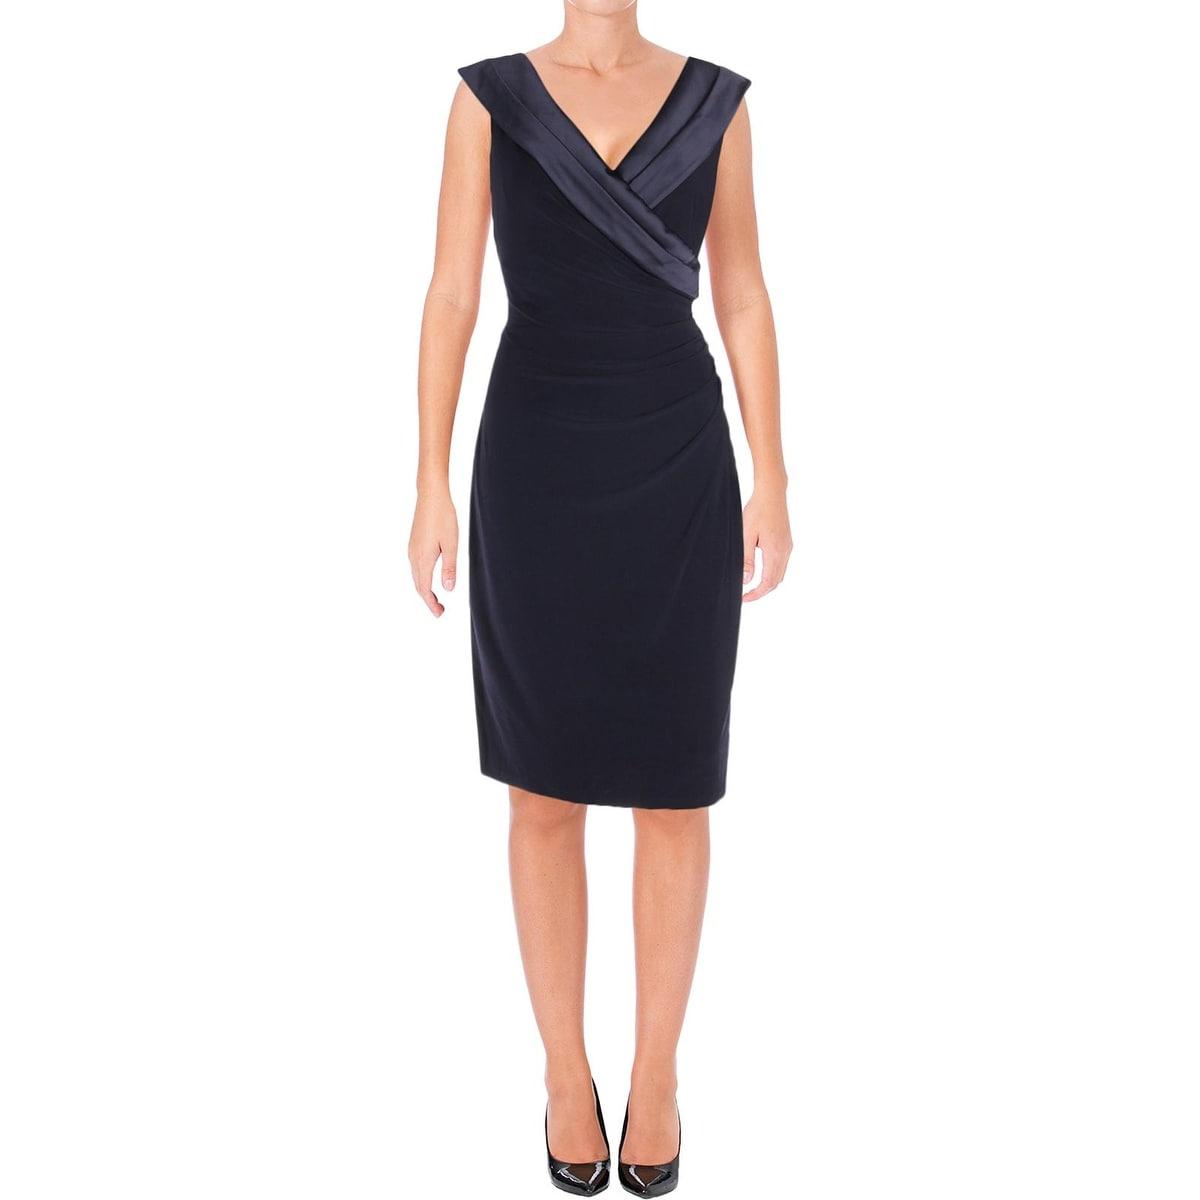 DressesFind Ralph Great Clothing Lauren Women's Deals dQtrshC